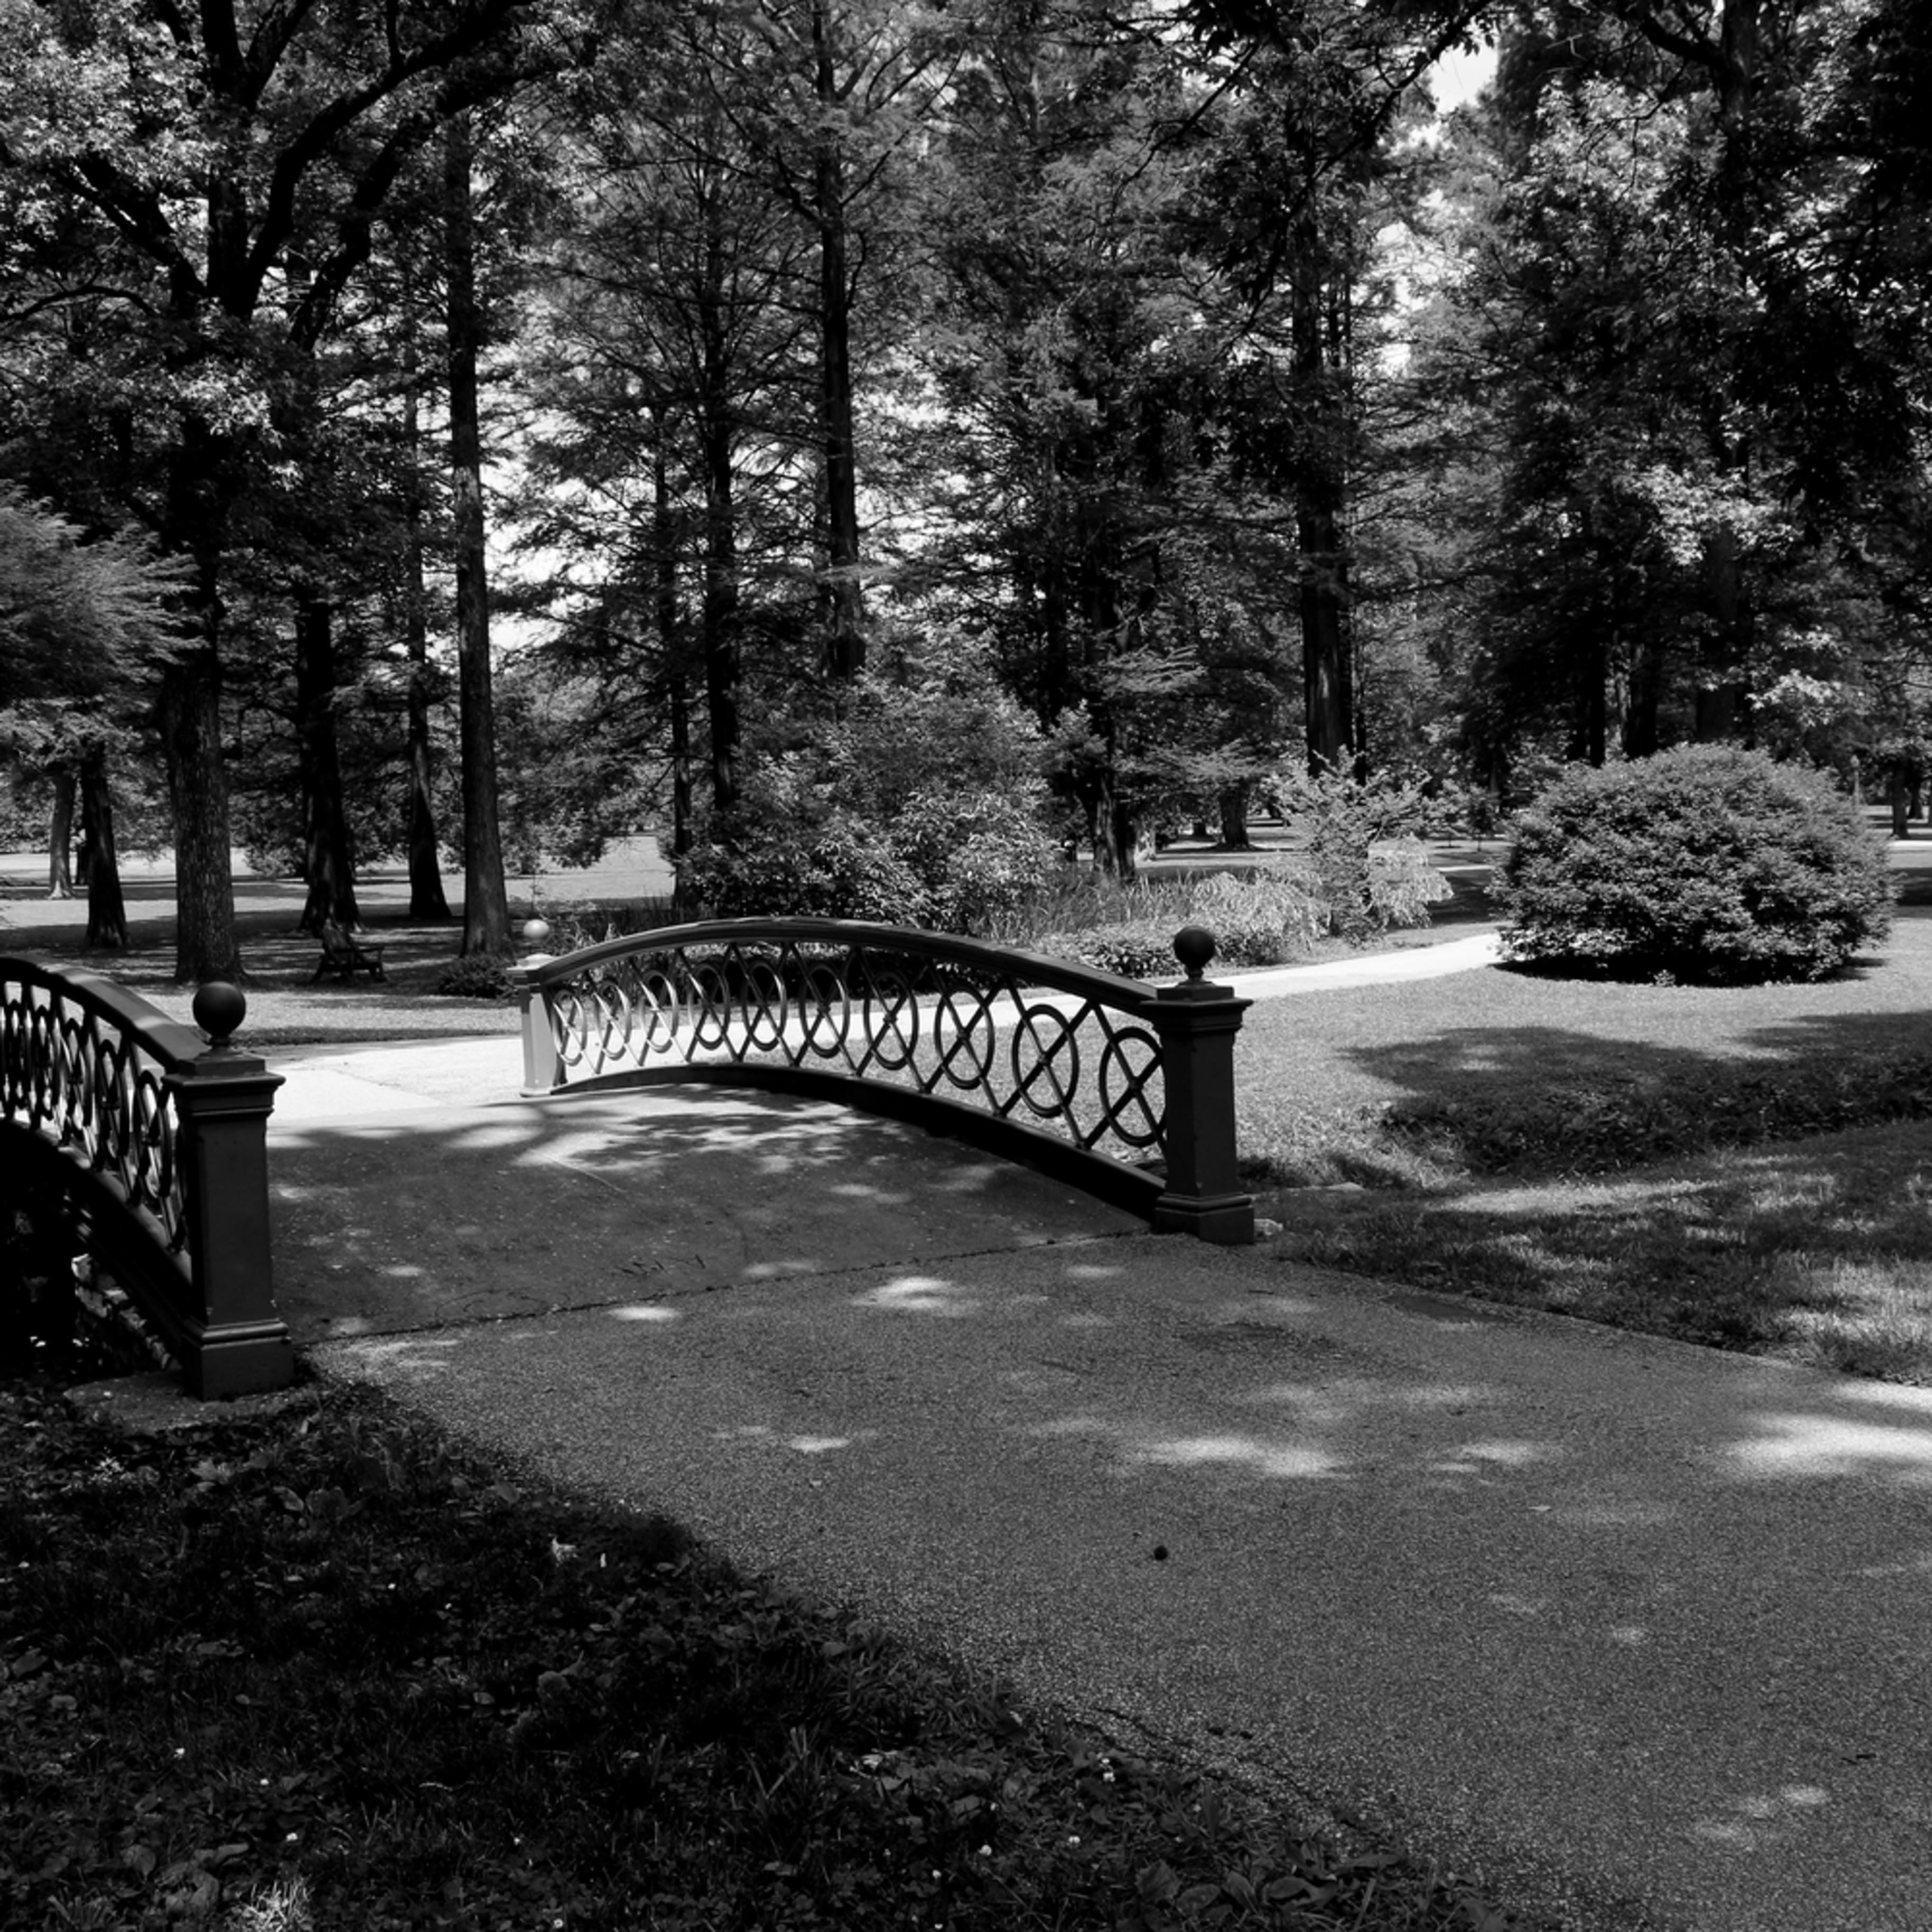 Bettymoore towergroveparkbridge bw 6391 igjhwd